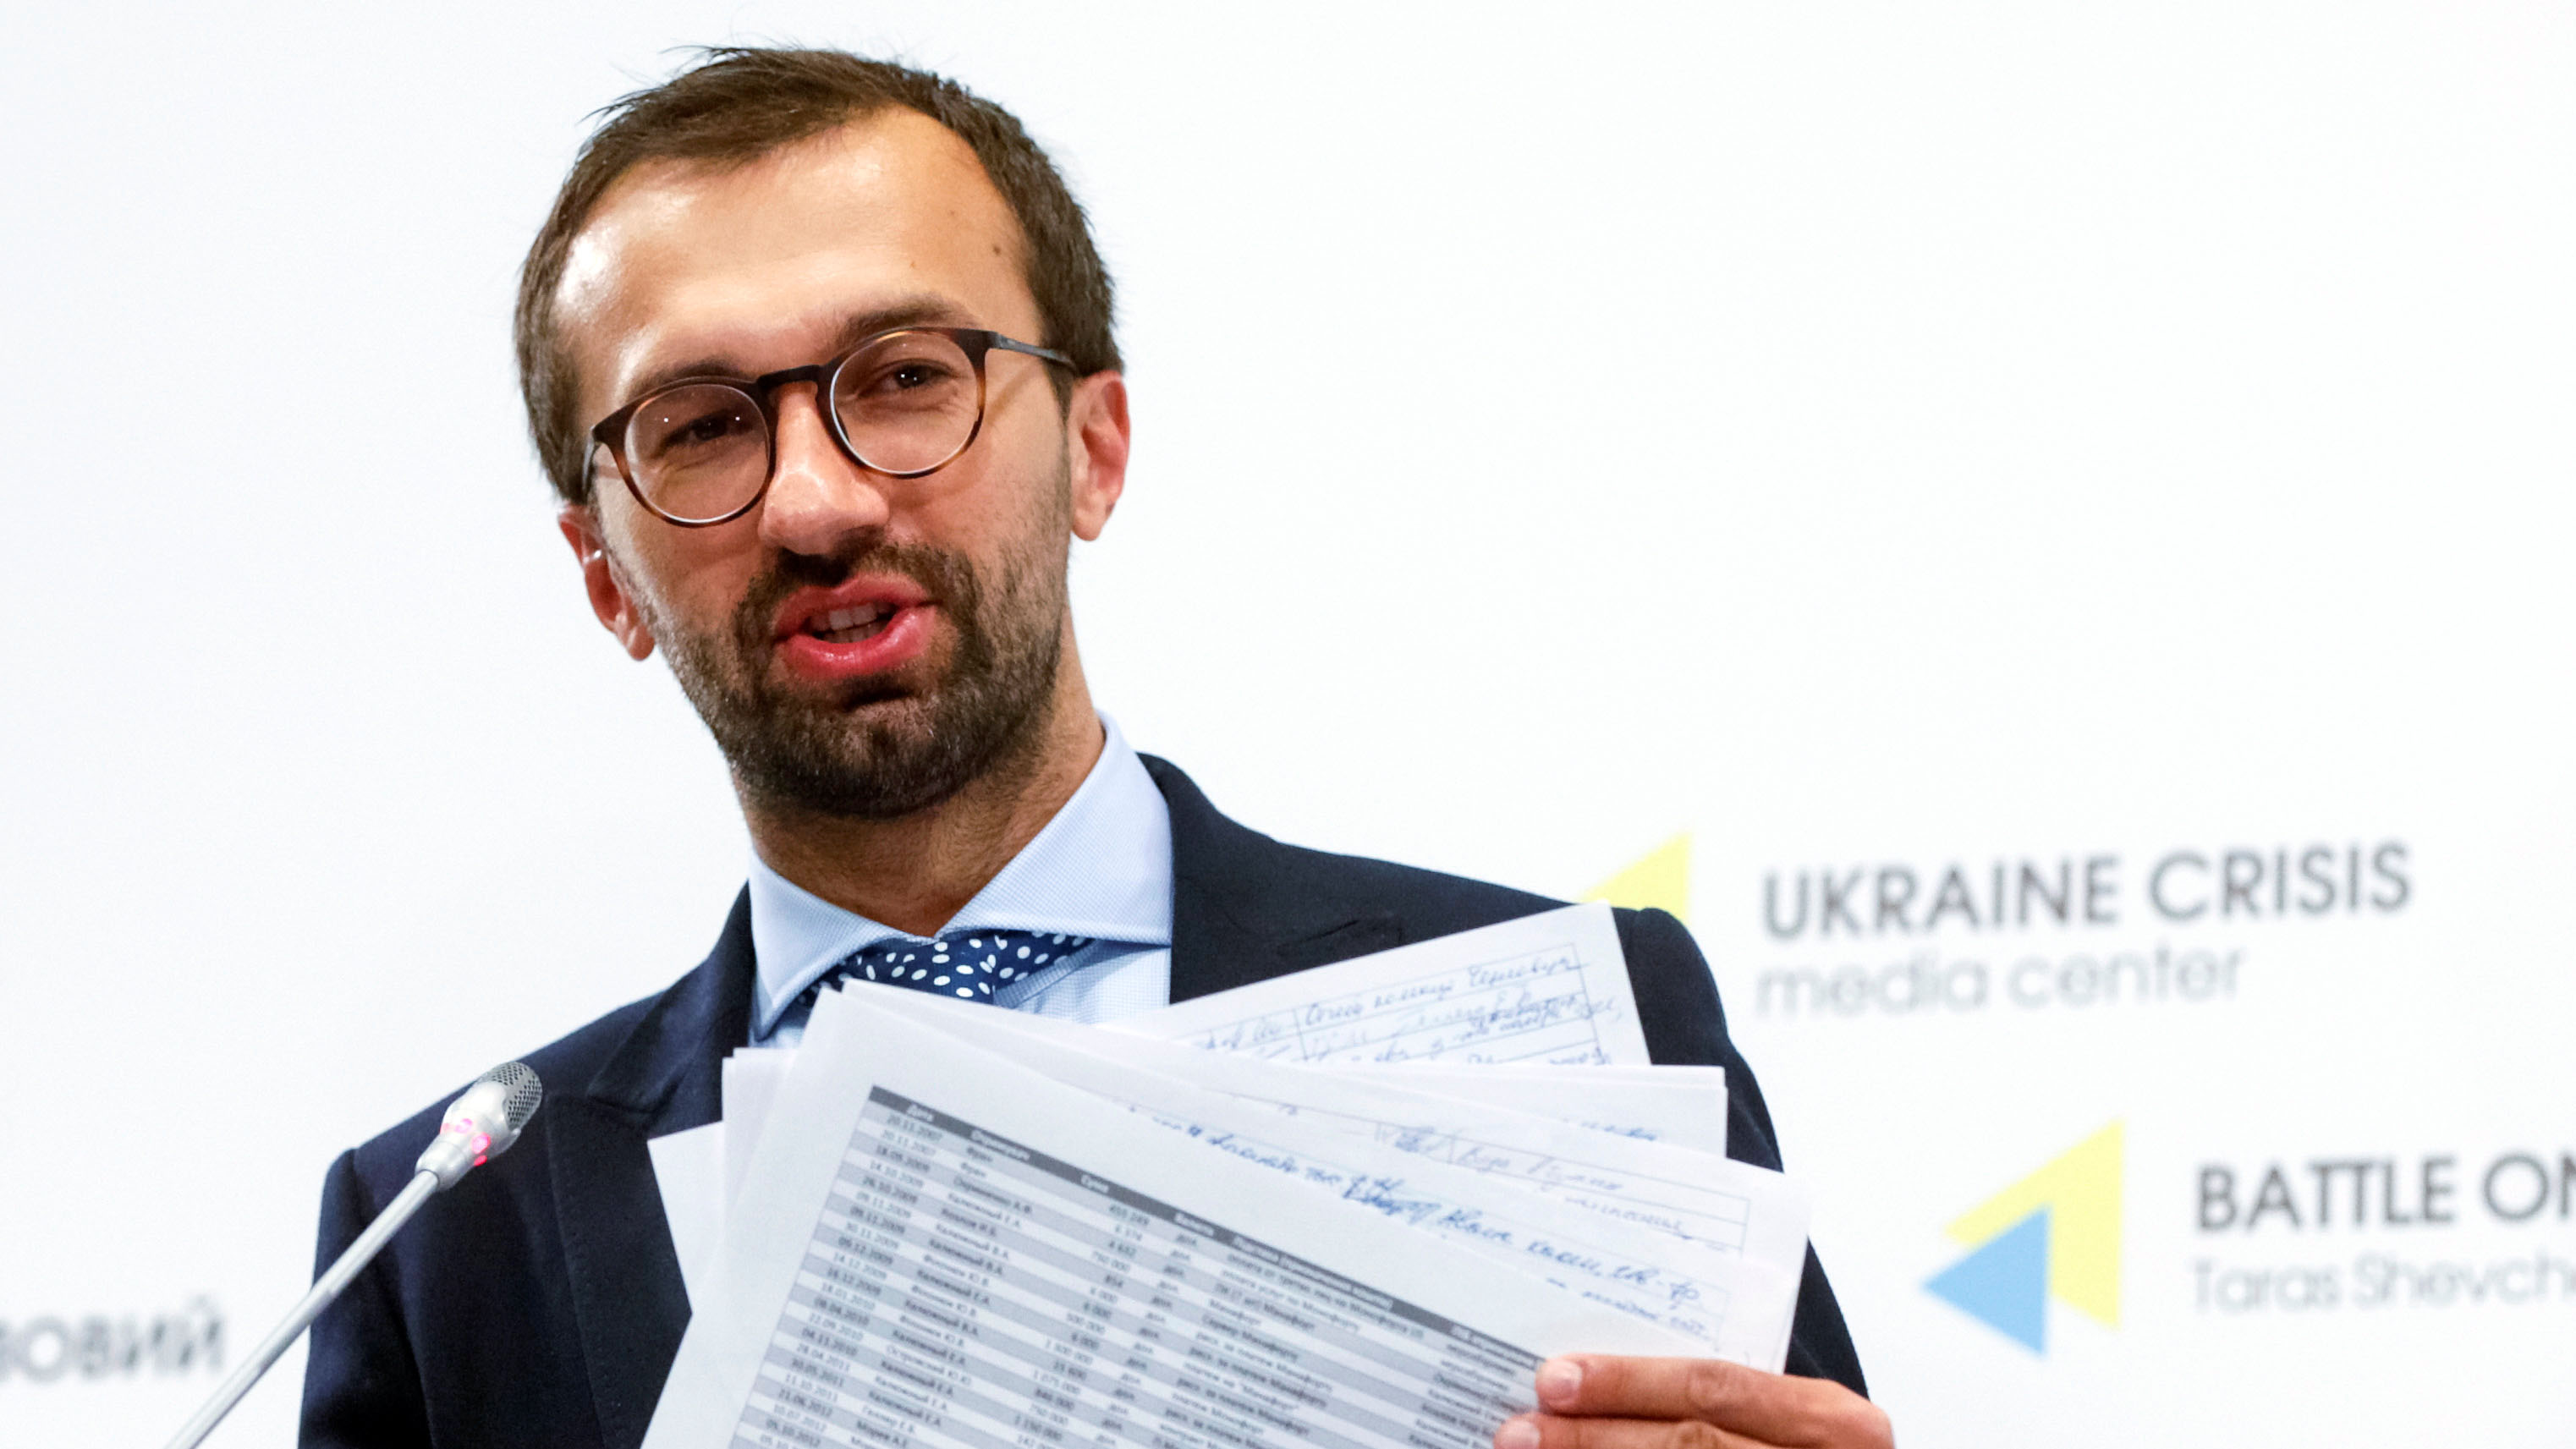 Former Ukrainian lawmaker Sergii Leshchenko displays papers from secret ledgers